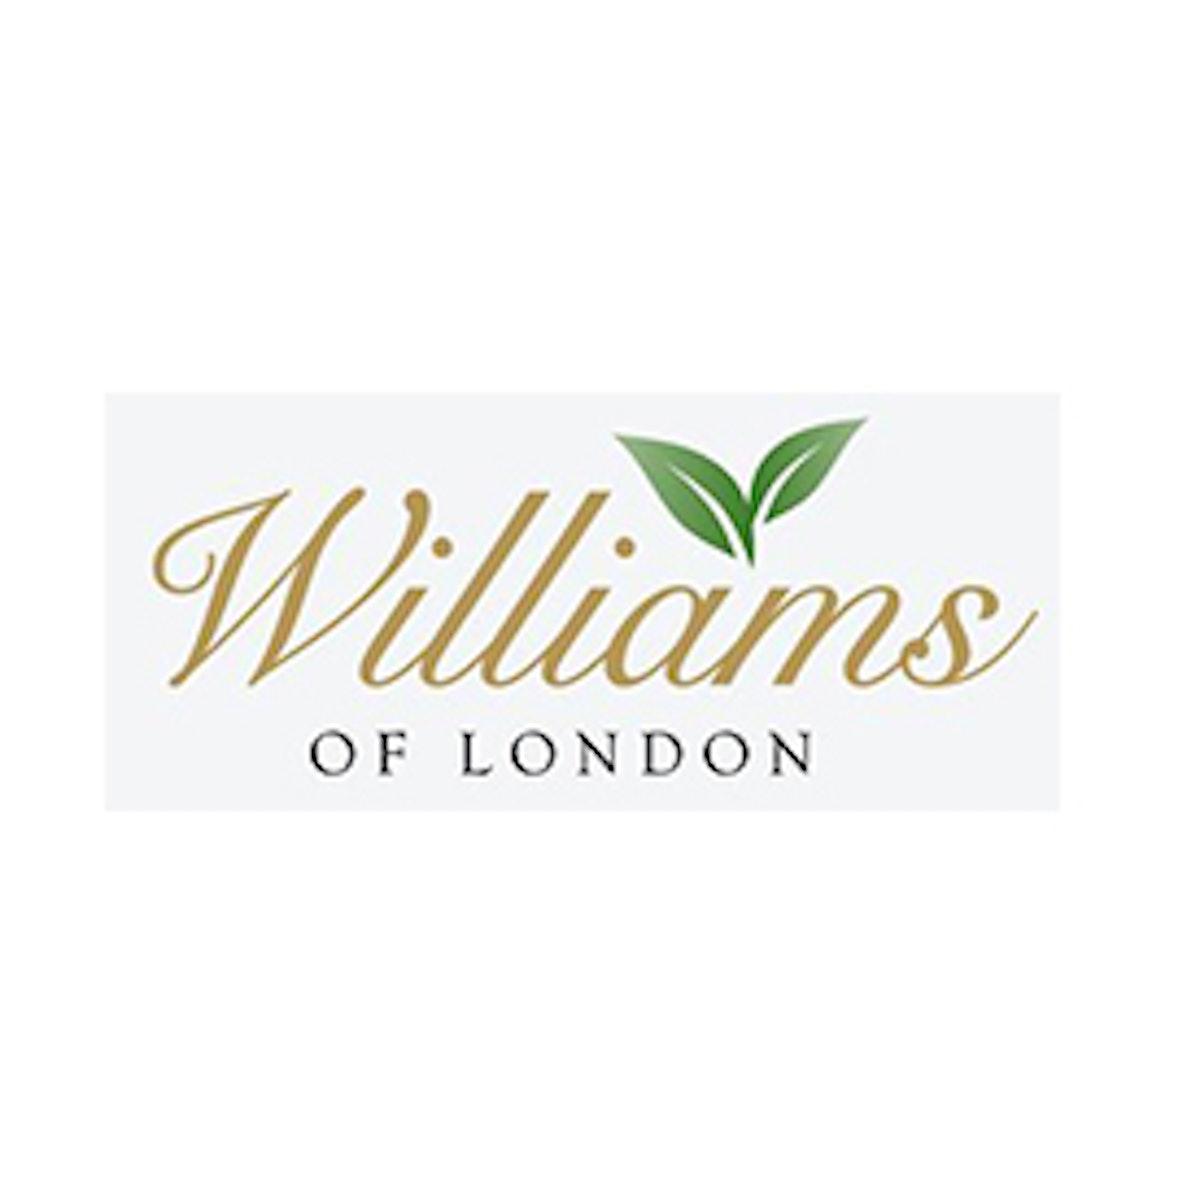 E A Williams